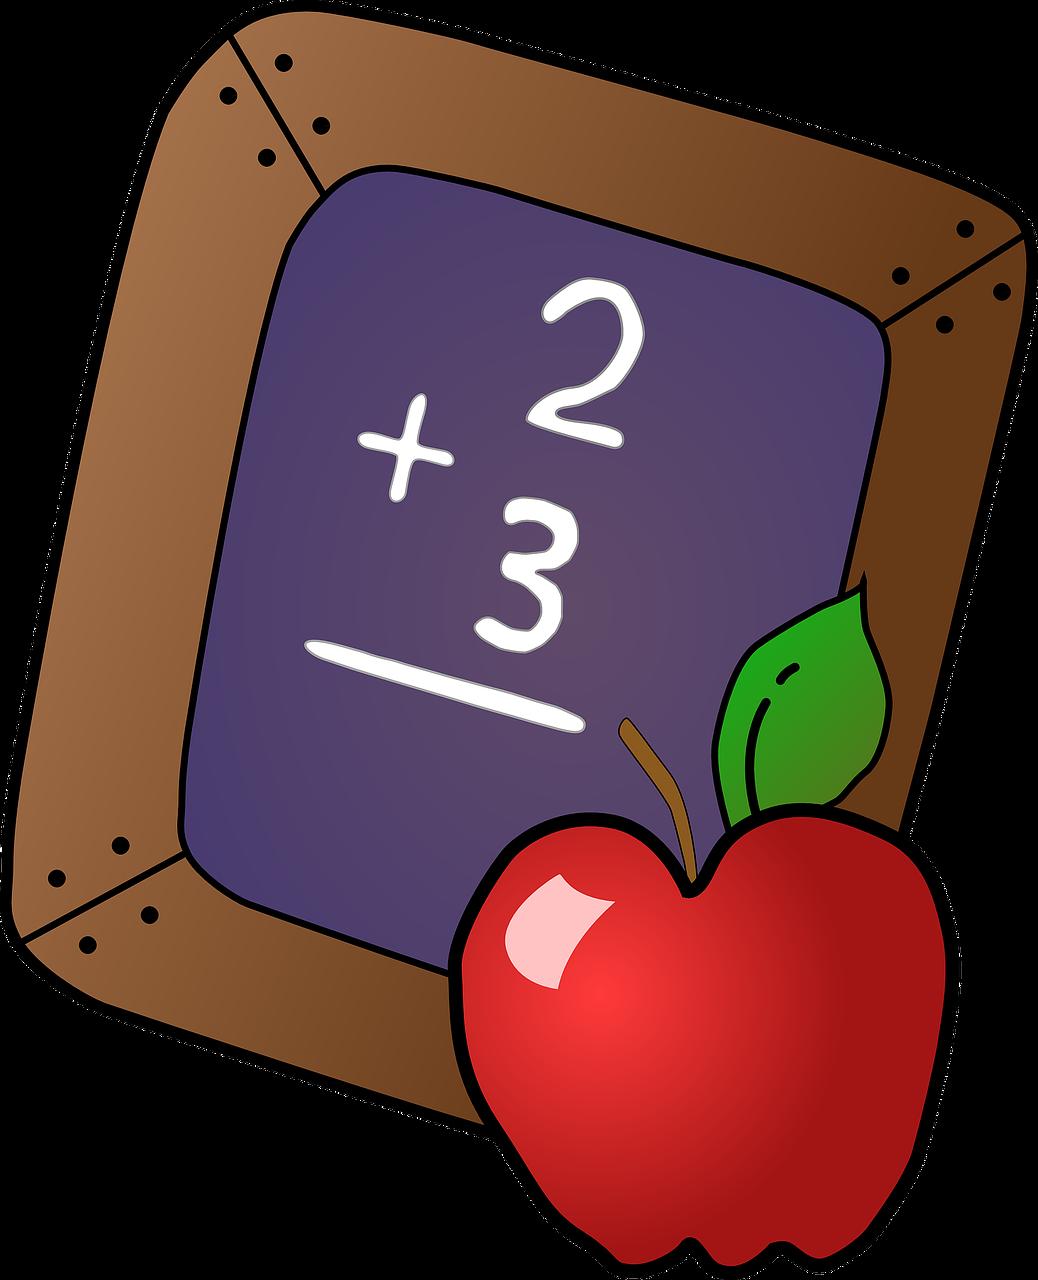 Addition clipart additon. Icse maths class animation